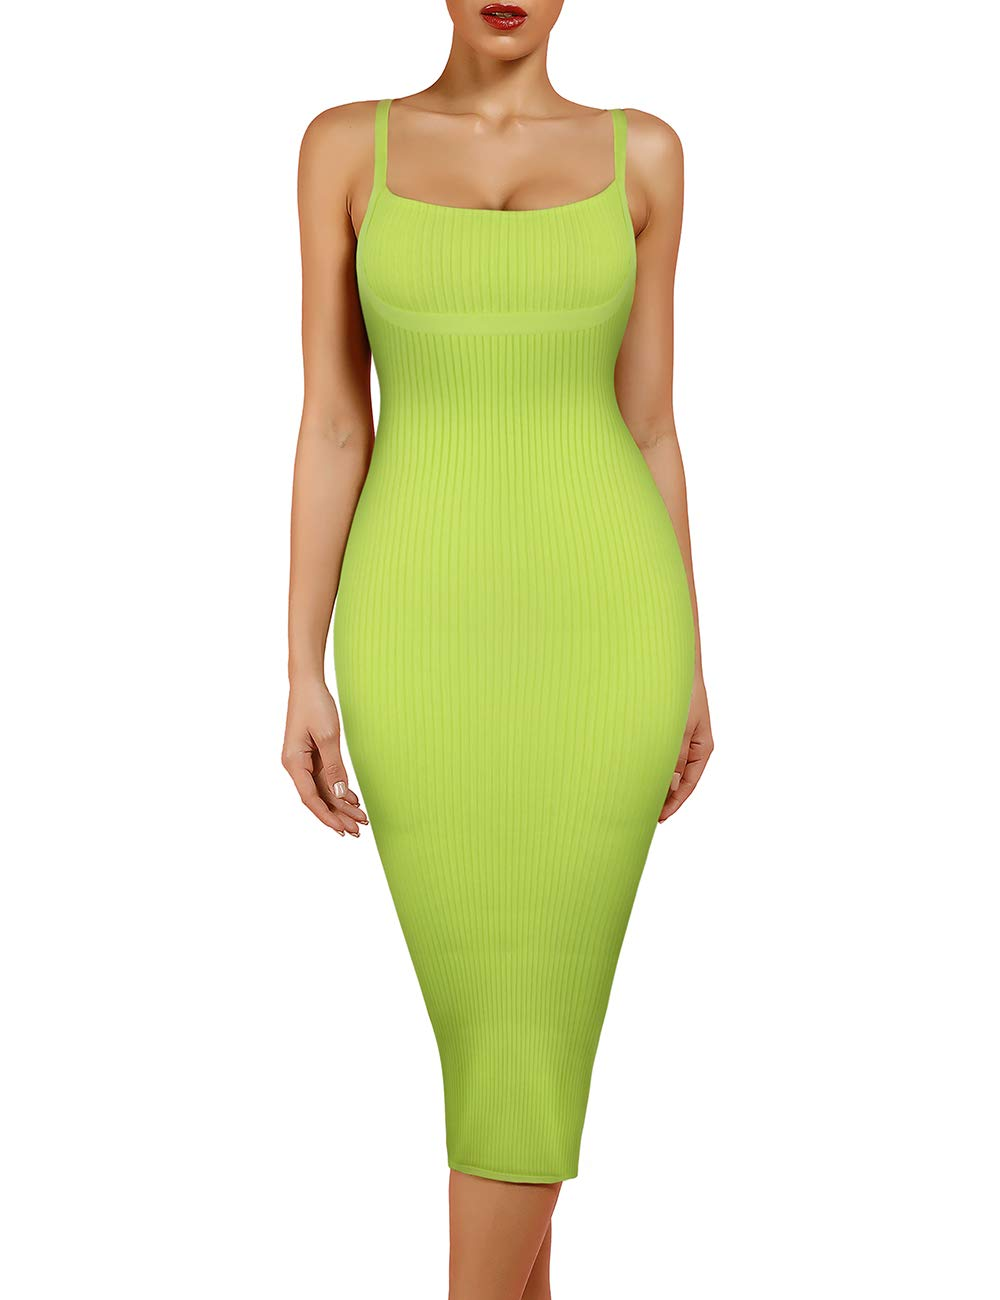 Available at Amazon: UONBOX Women's Strappy Sleeveless Bottom Slitted Plain Party Bodycon Bandage Dress